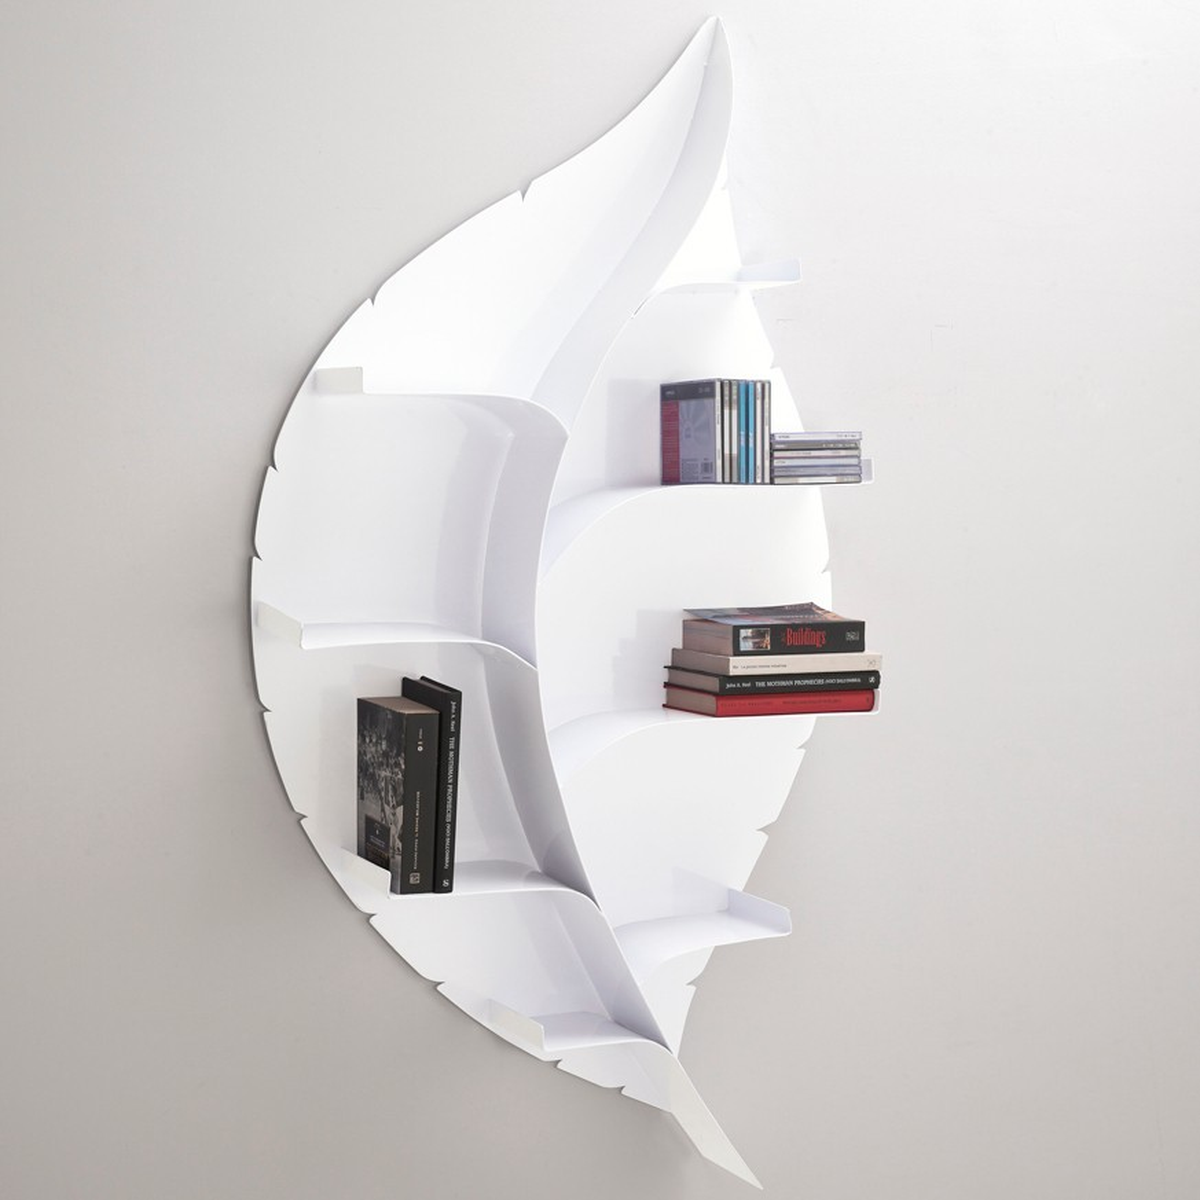 Blatt libreria a parete design moderno in metallo bianca for Librerie di design a parete